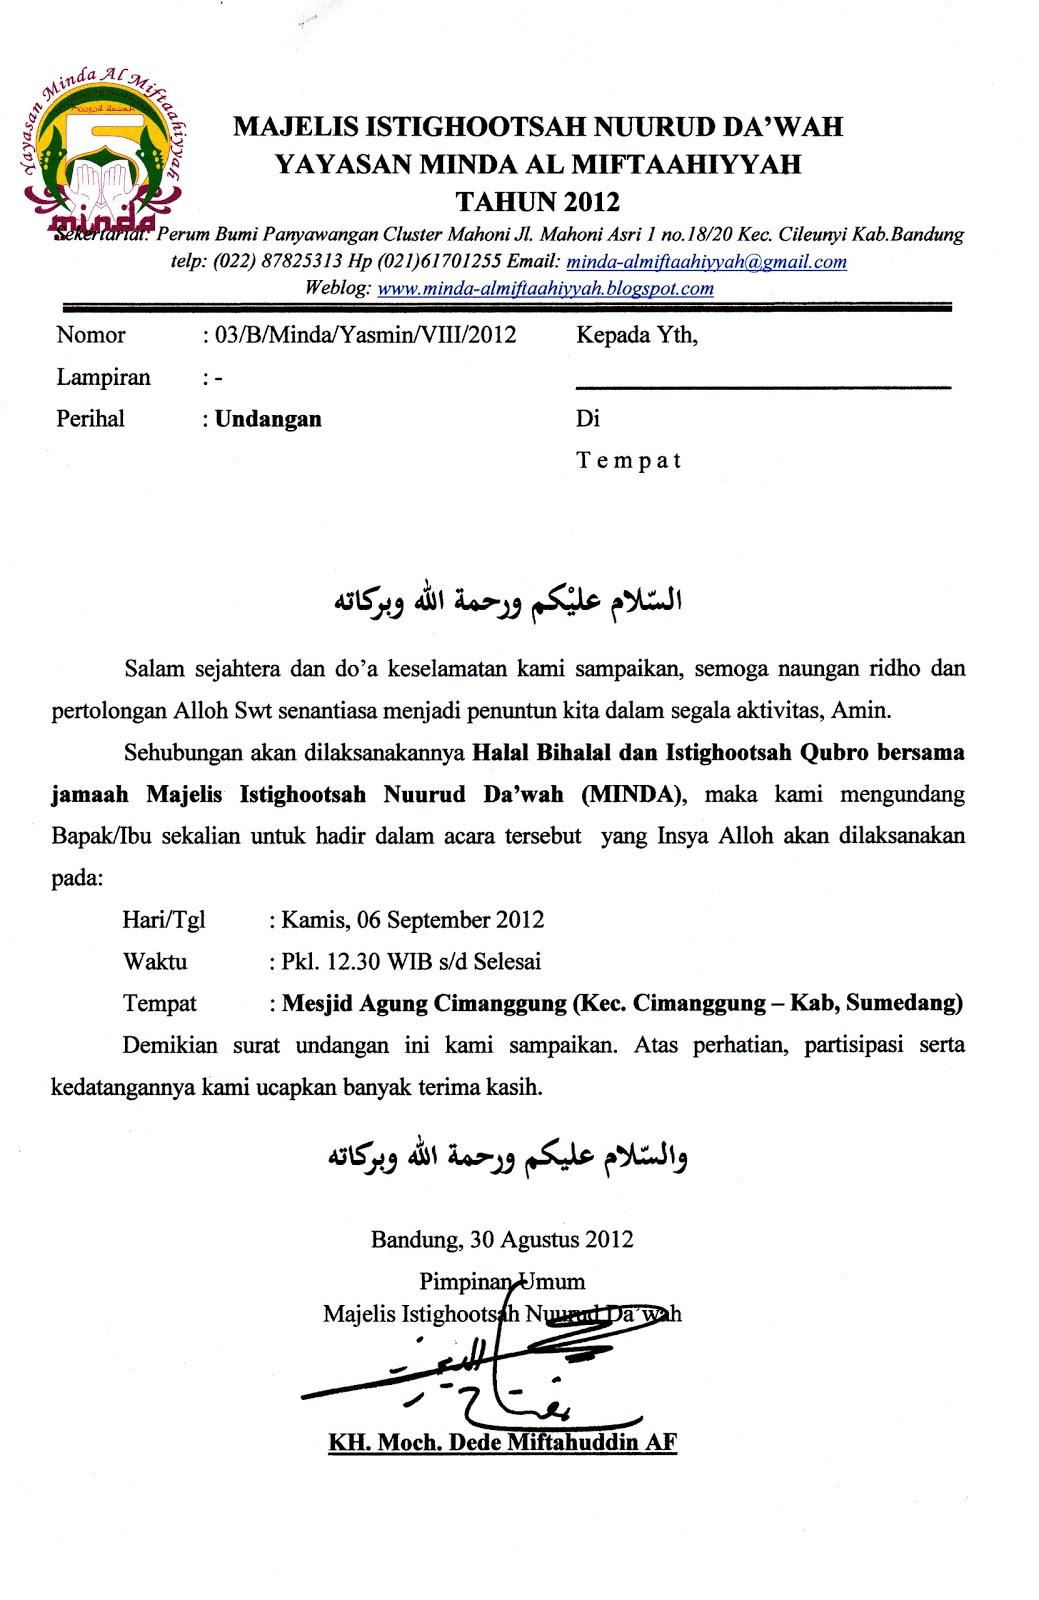 Berikut ini merupakan contoh surat undangan resmi: